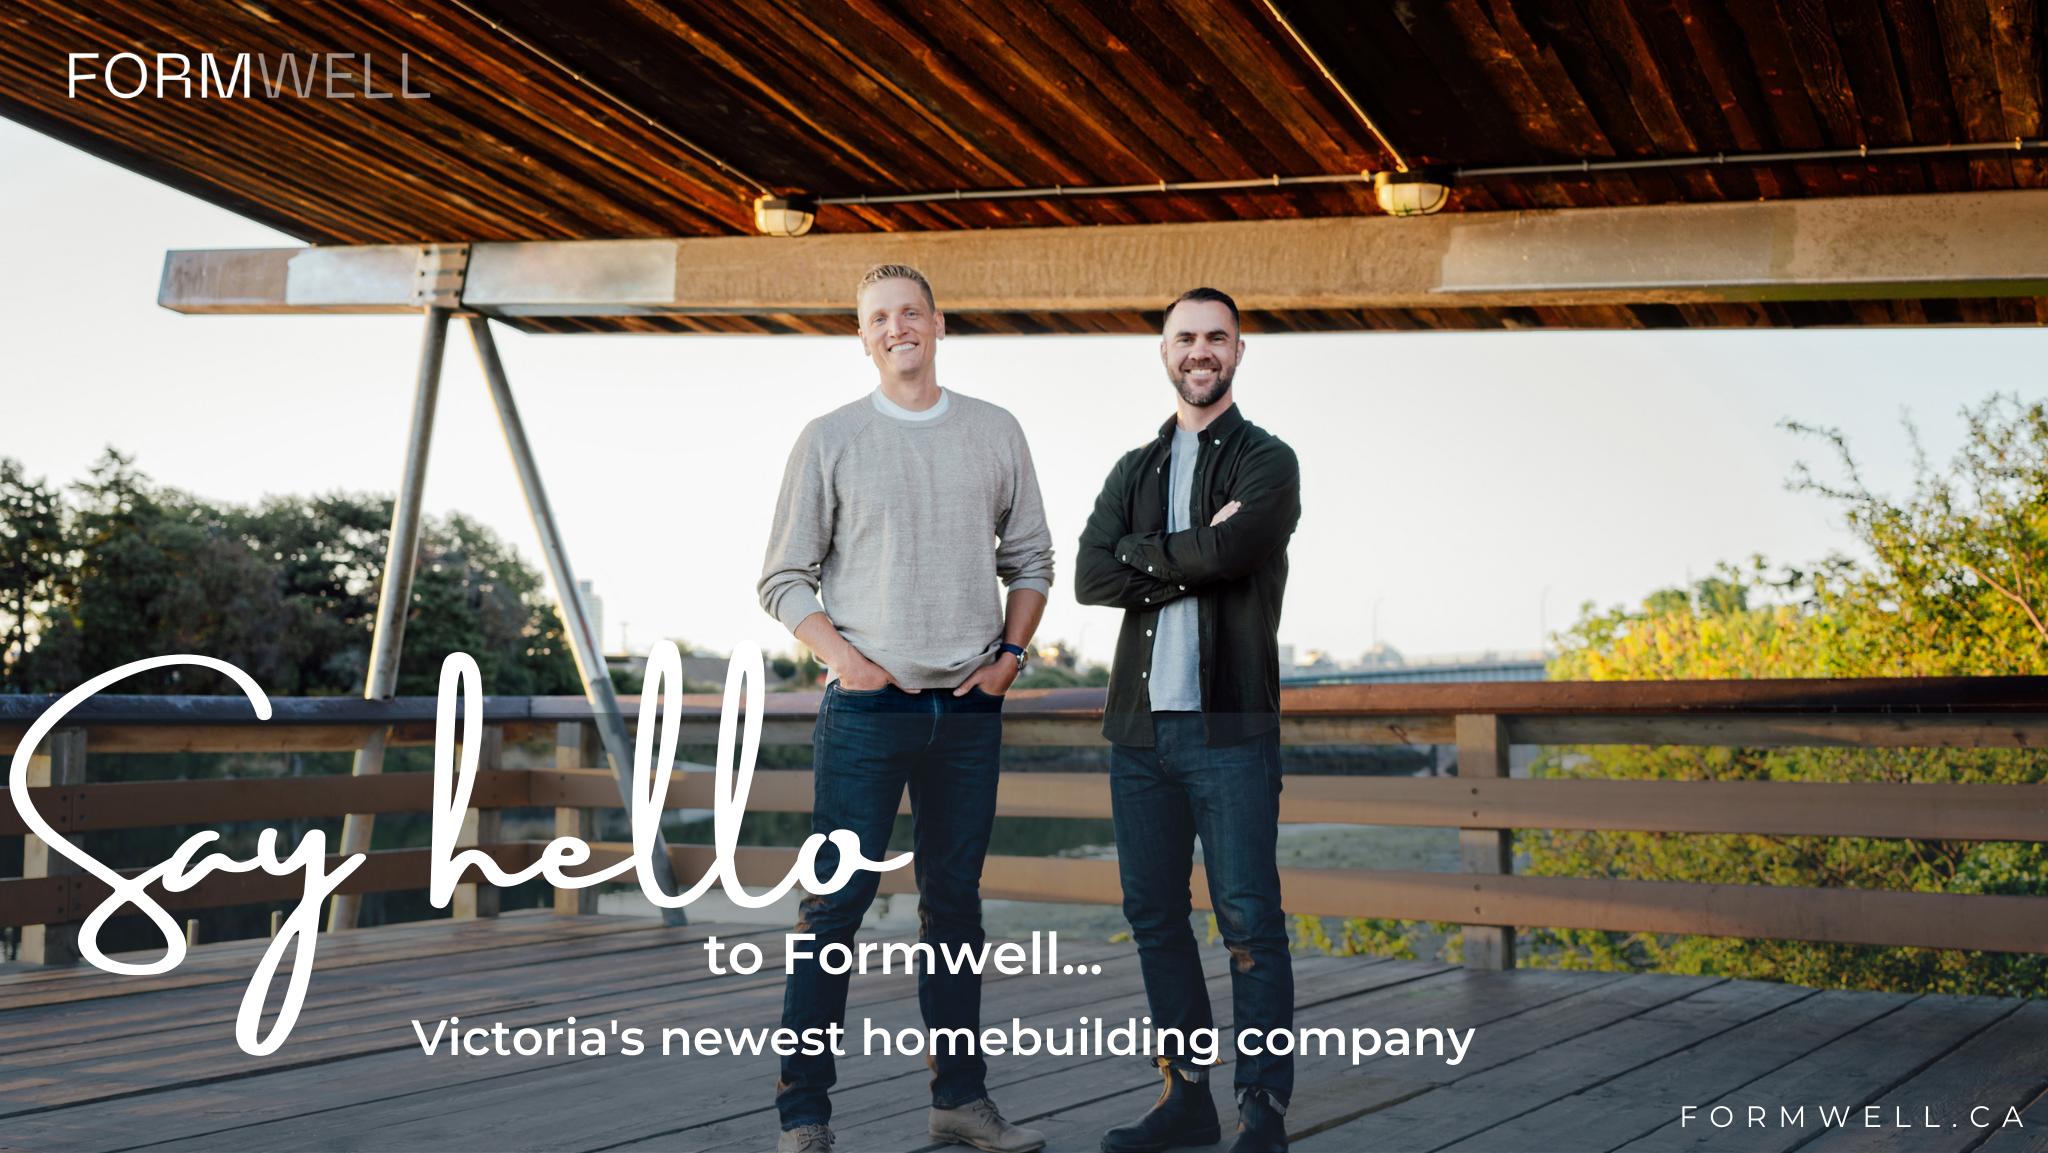 Townhomes, Condo, Washington, Formwell, Developers, Burnside Gorge, Victoria, BC, YYJ, Vancouver Island